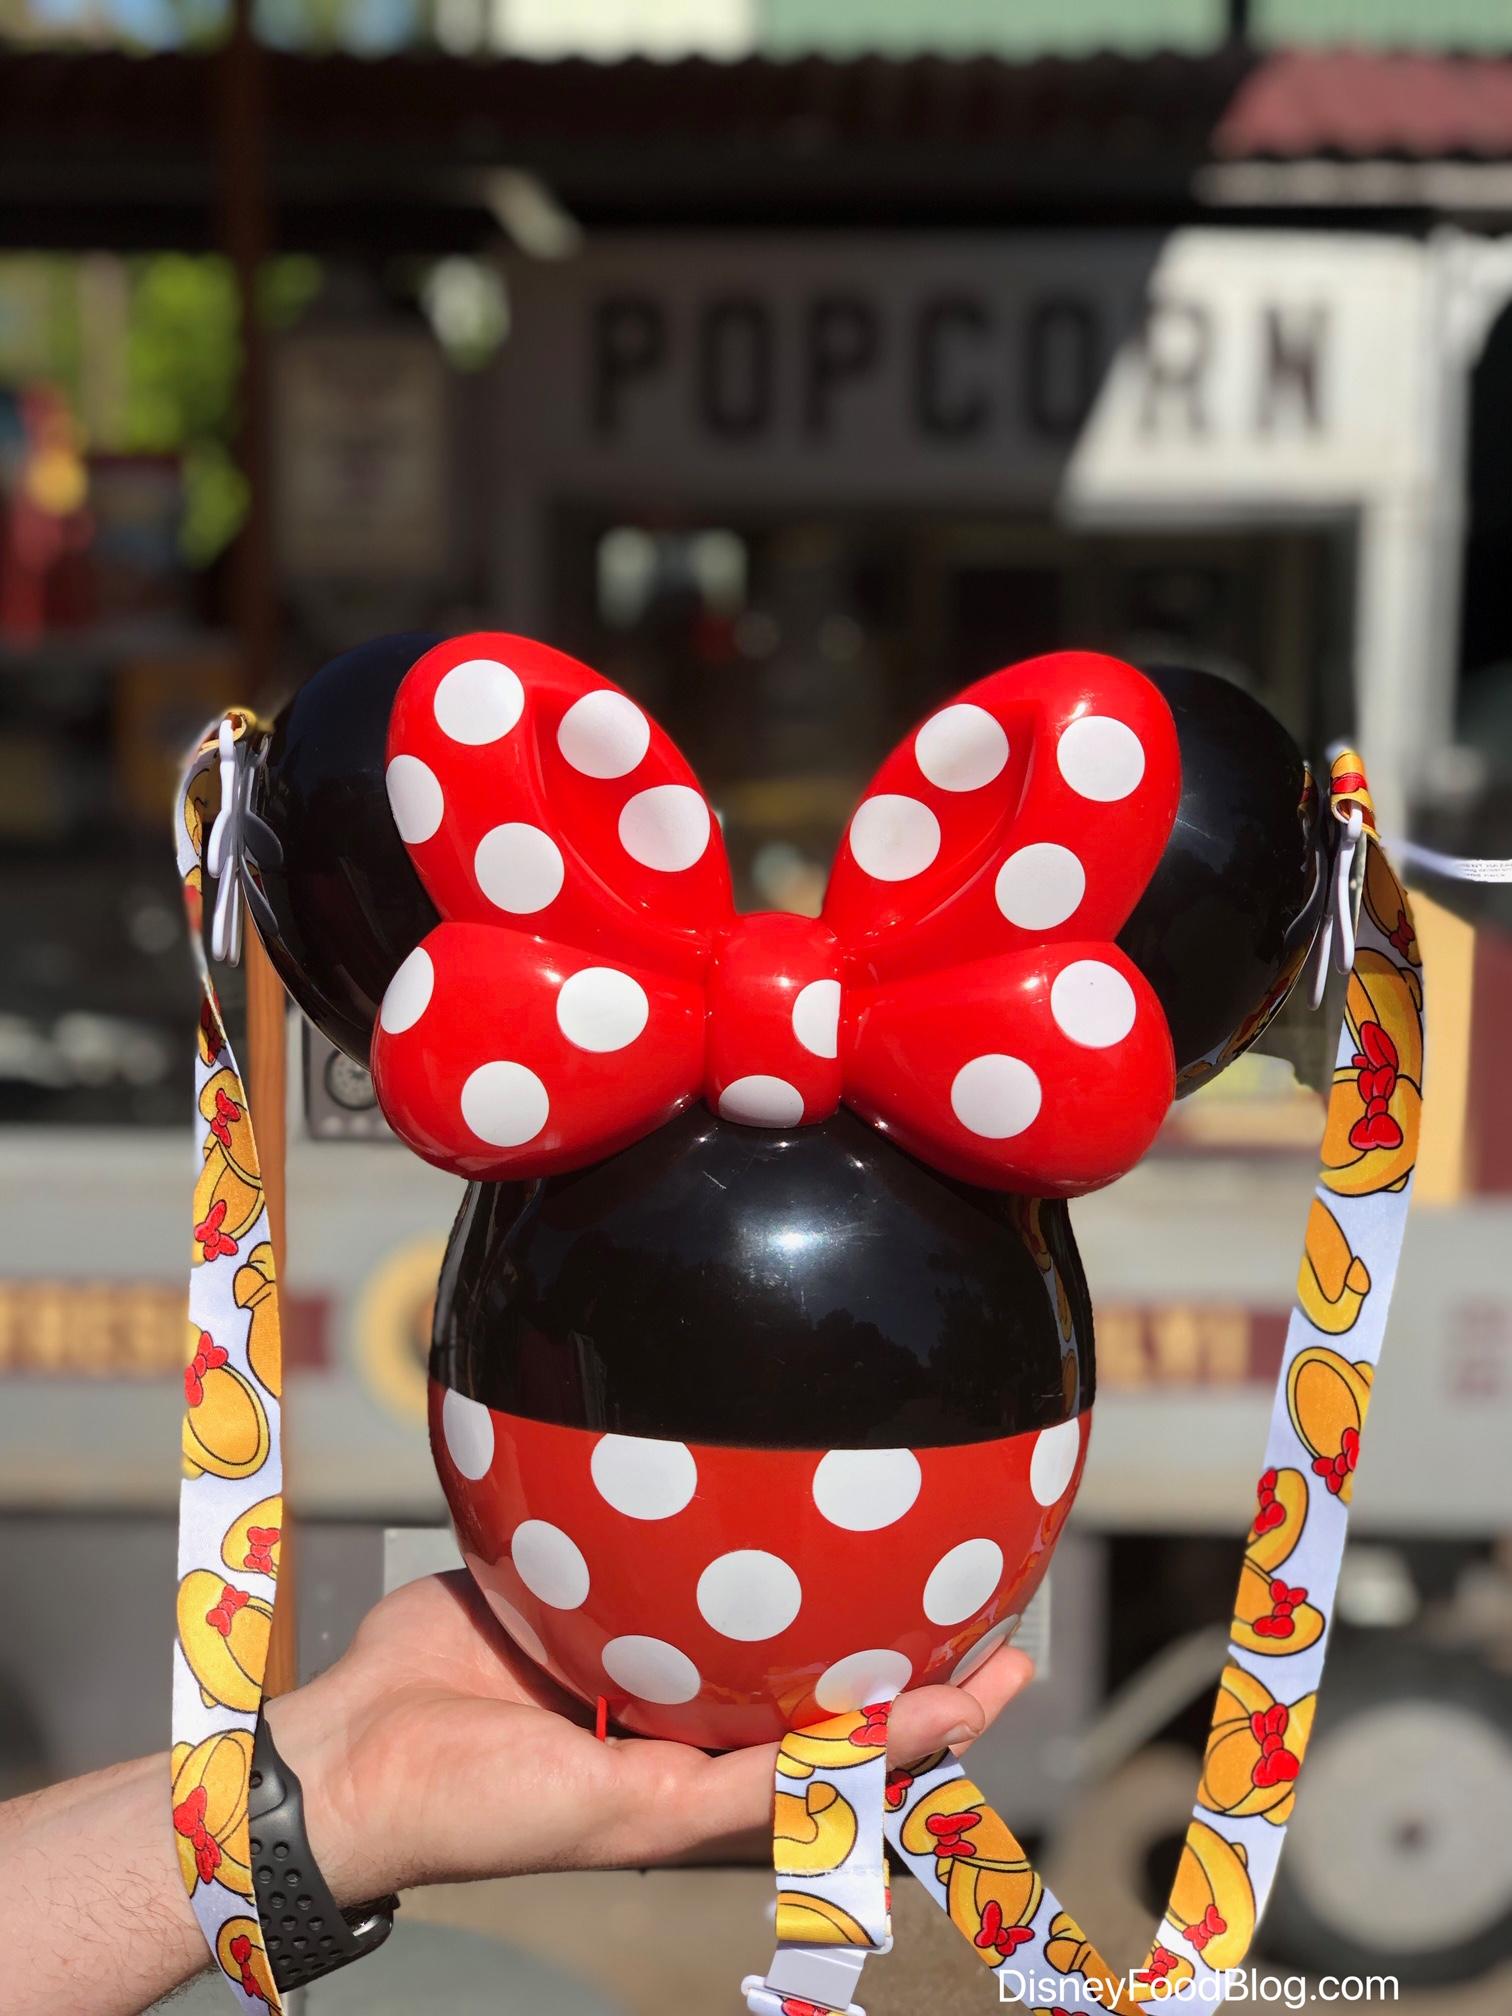 Disneyland Halloween Popcorn Bucket 2019.The New Minnie Balloon Popcorn Bucket Has Landed In Disneyland